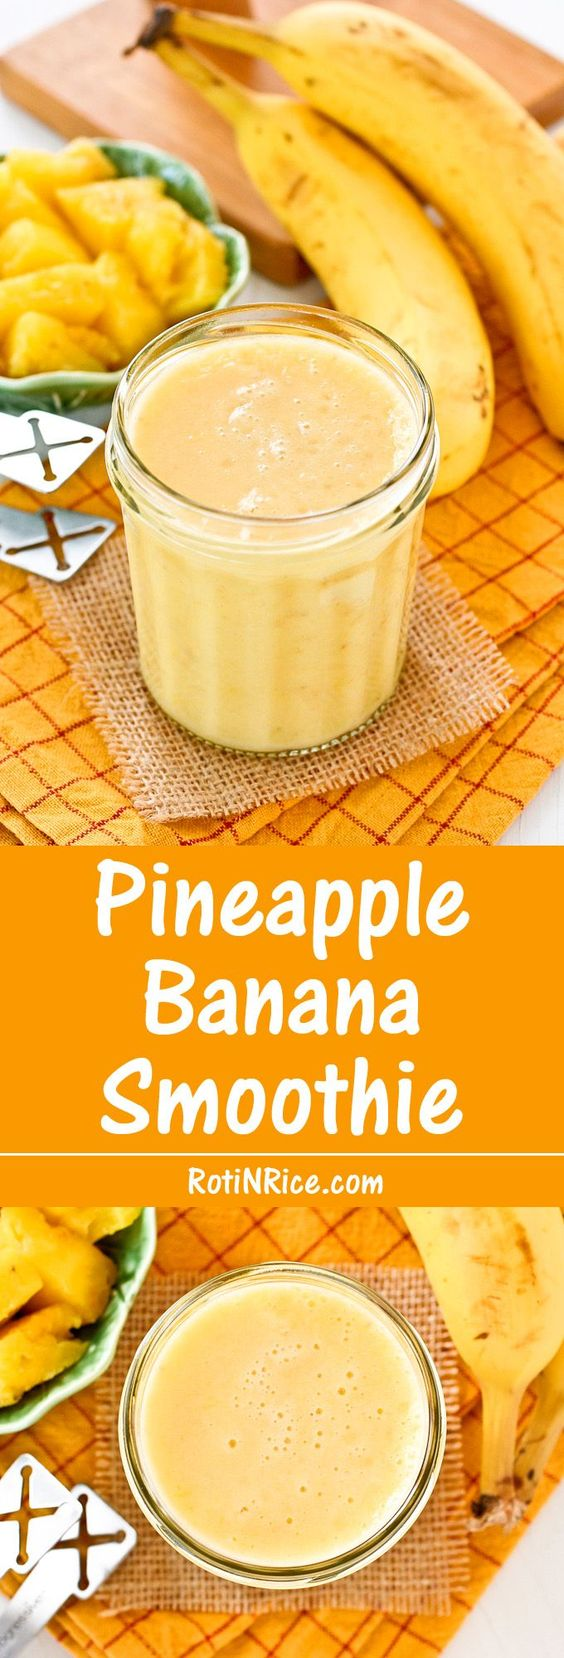 ... smoothies almonds bananas tropical milk healthy food pineapple banana